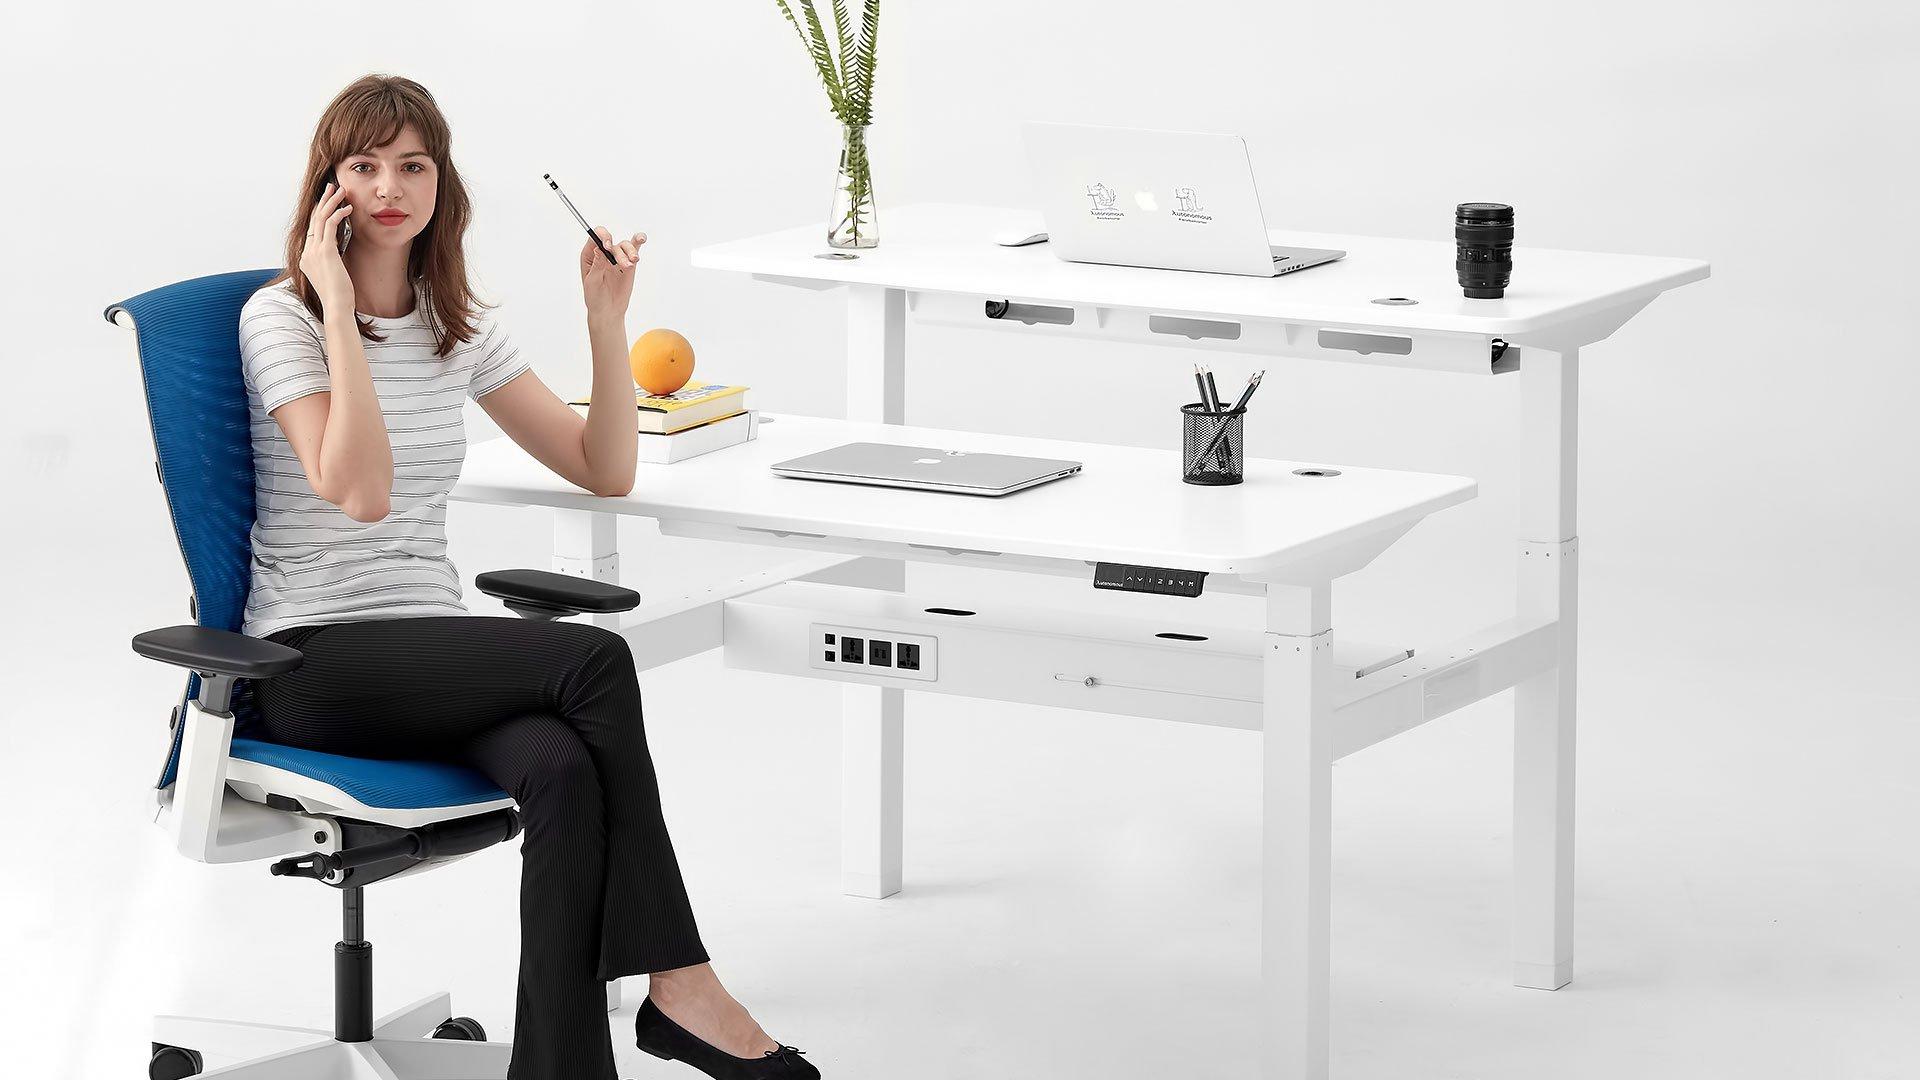 Change your posture and ergonomic settings often